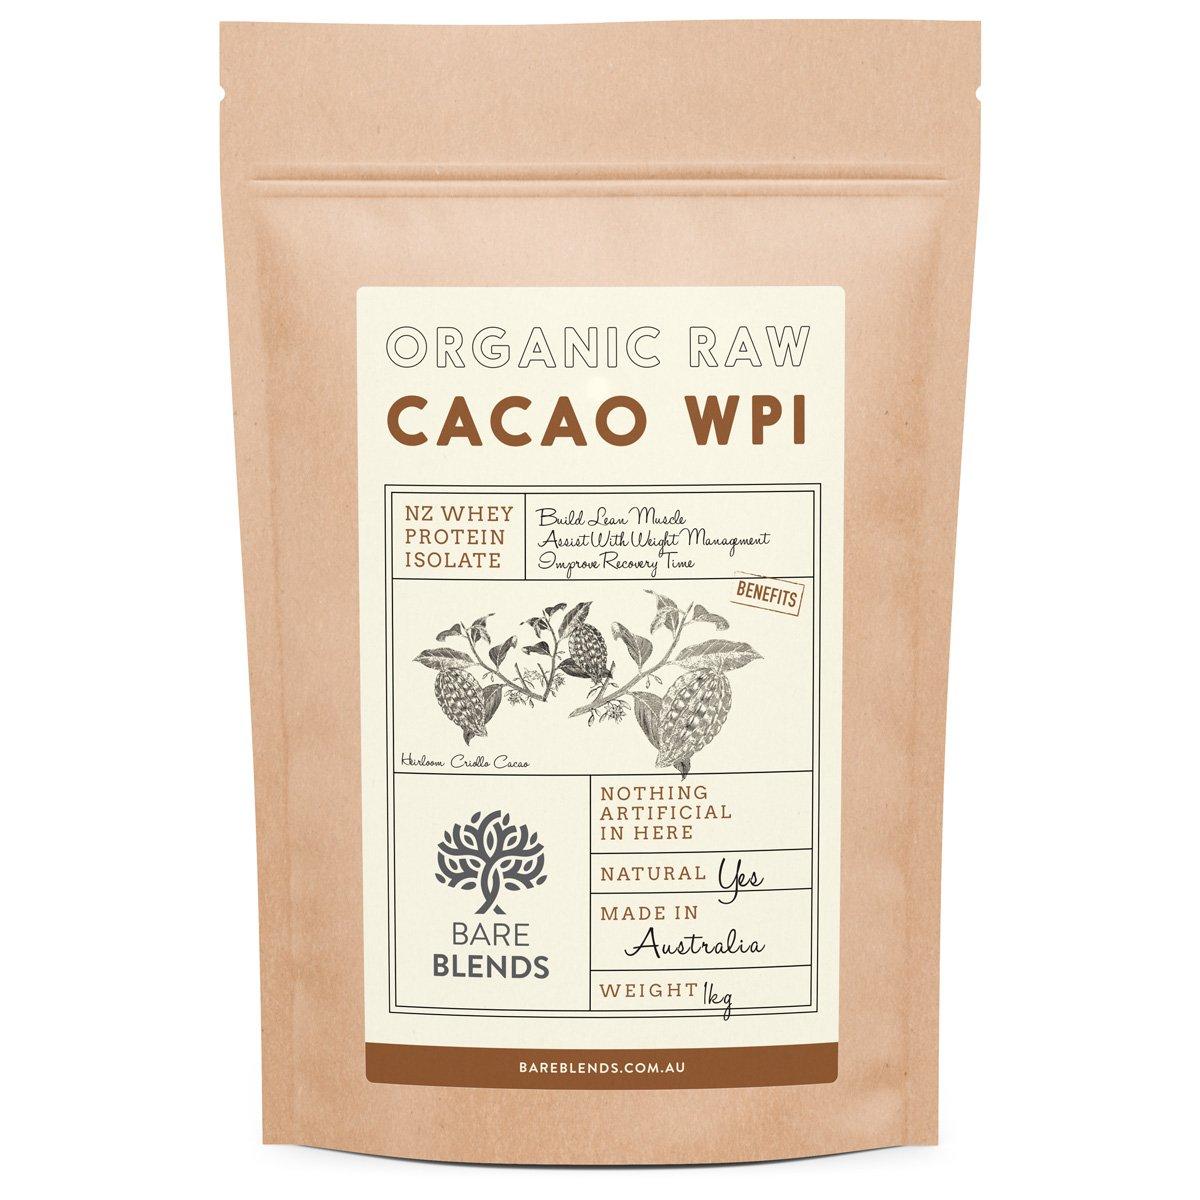 1kg Natural Whey Predein Isolate & Organic Raw Cacao   WPI   Chocolate Whey Predein Powder   Gluten Free   nonGMO   500g